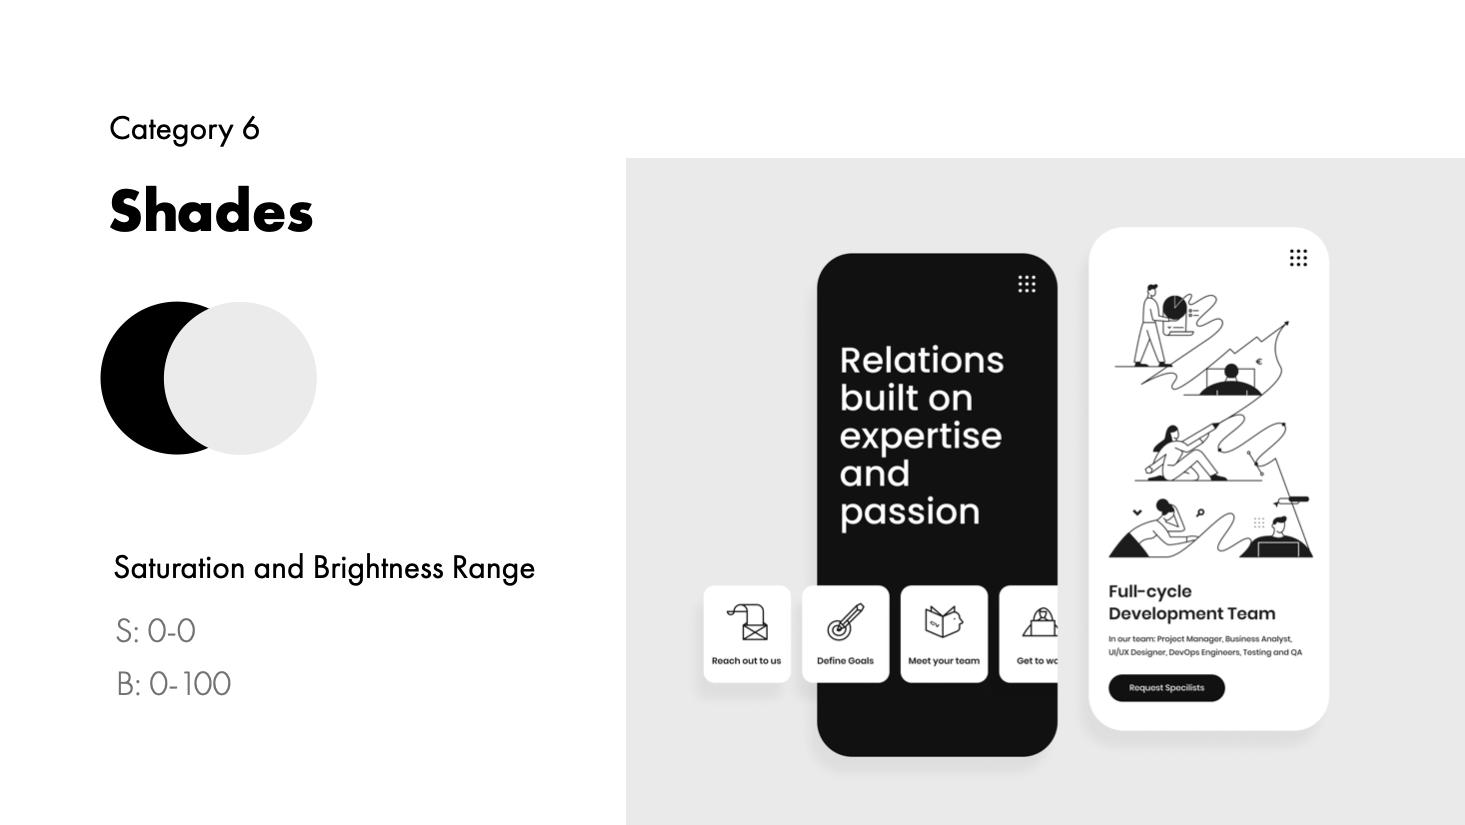 Shade examples and range | IT Website Concept by Maryna Gerdiy for QArea